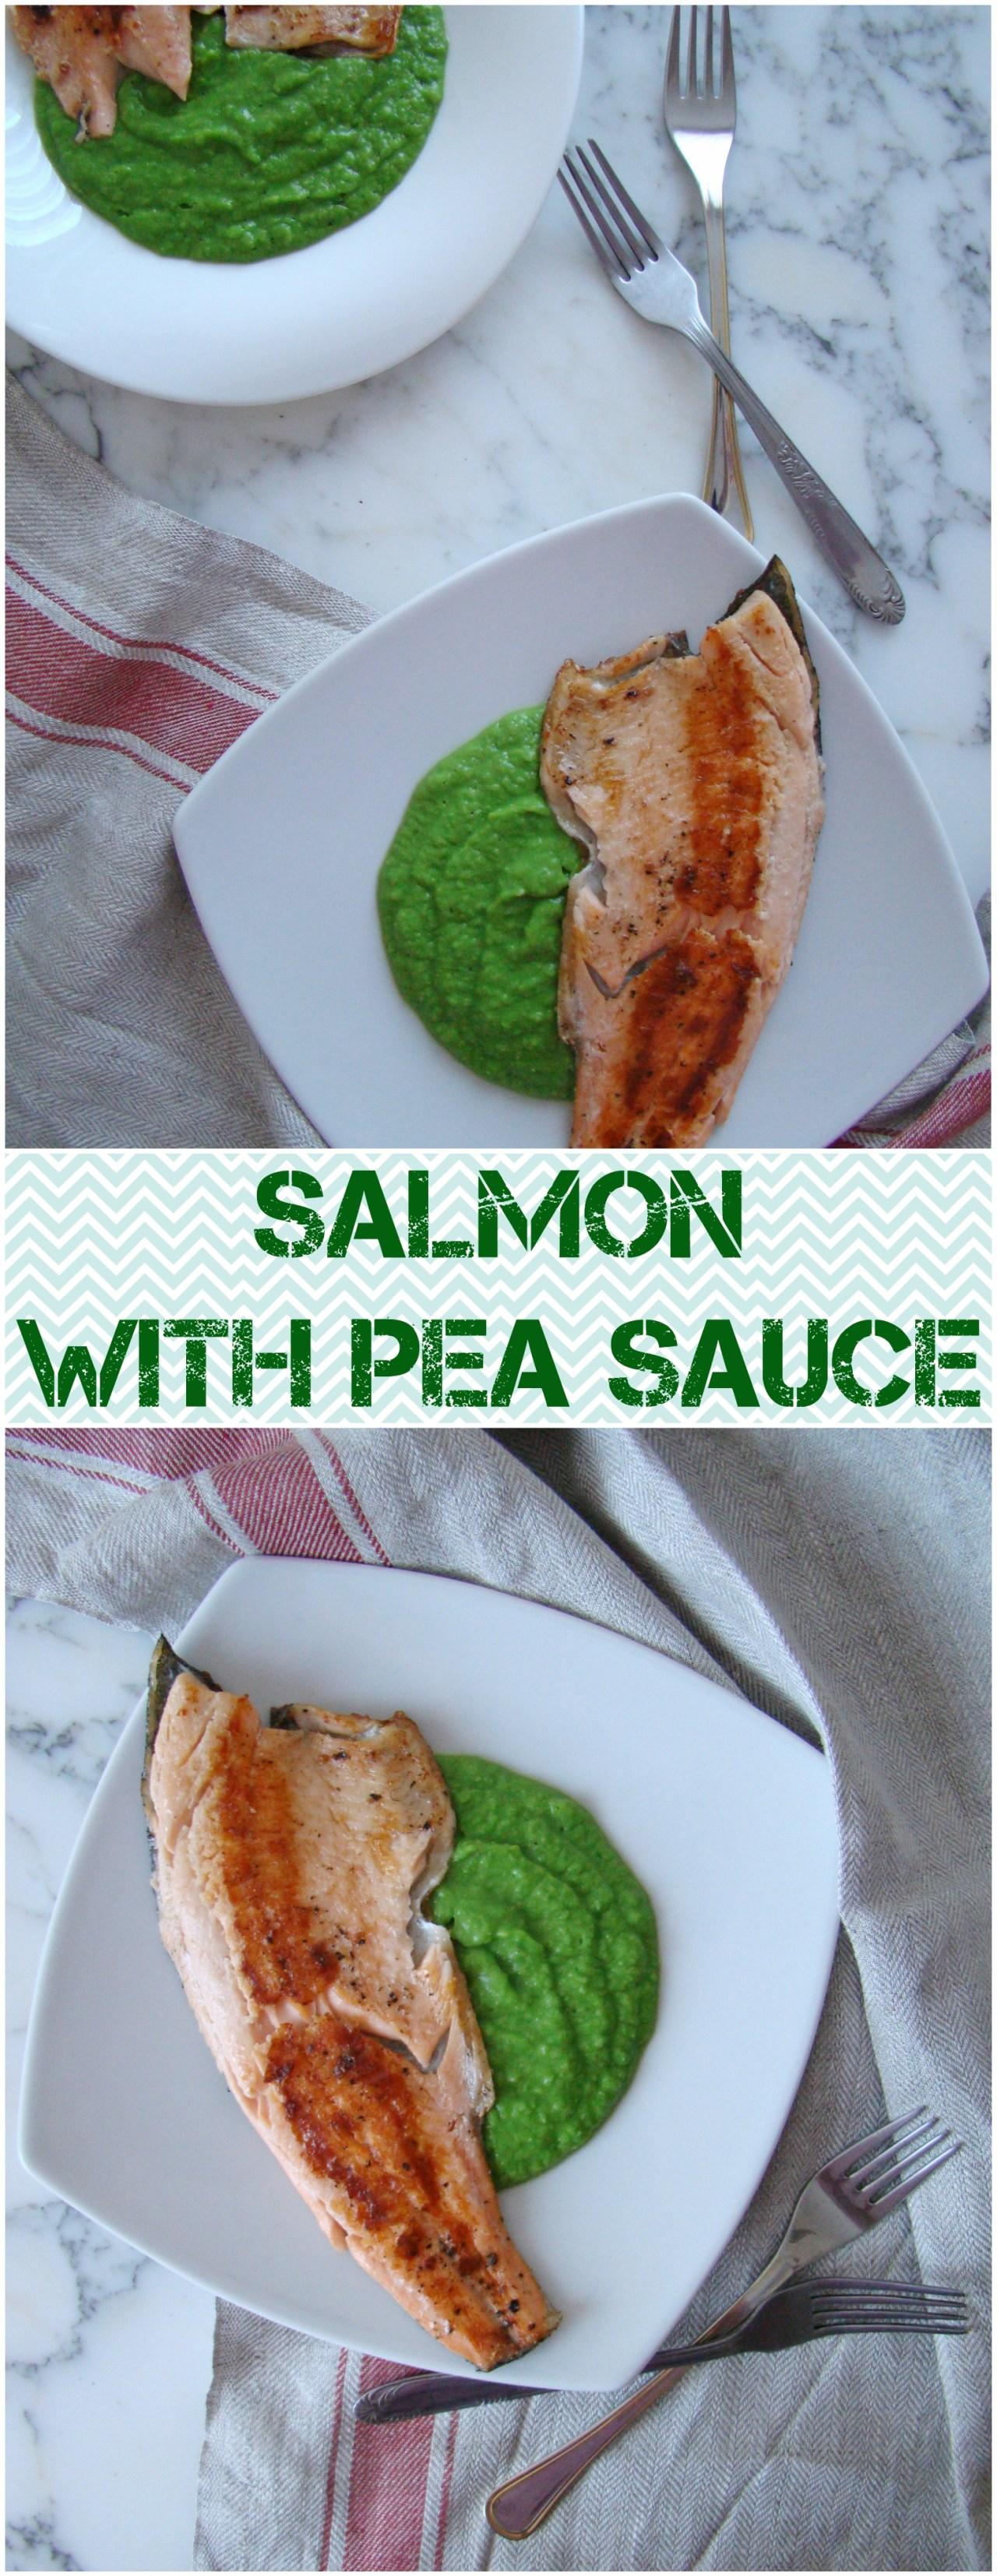 salmon-with-pea-sauce